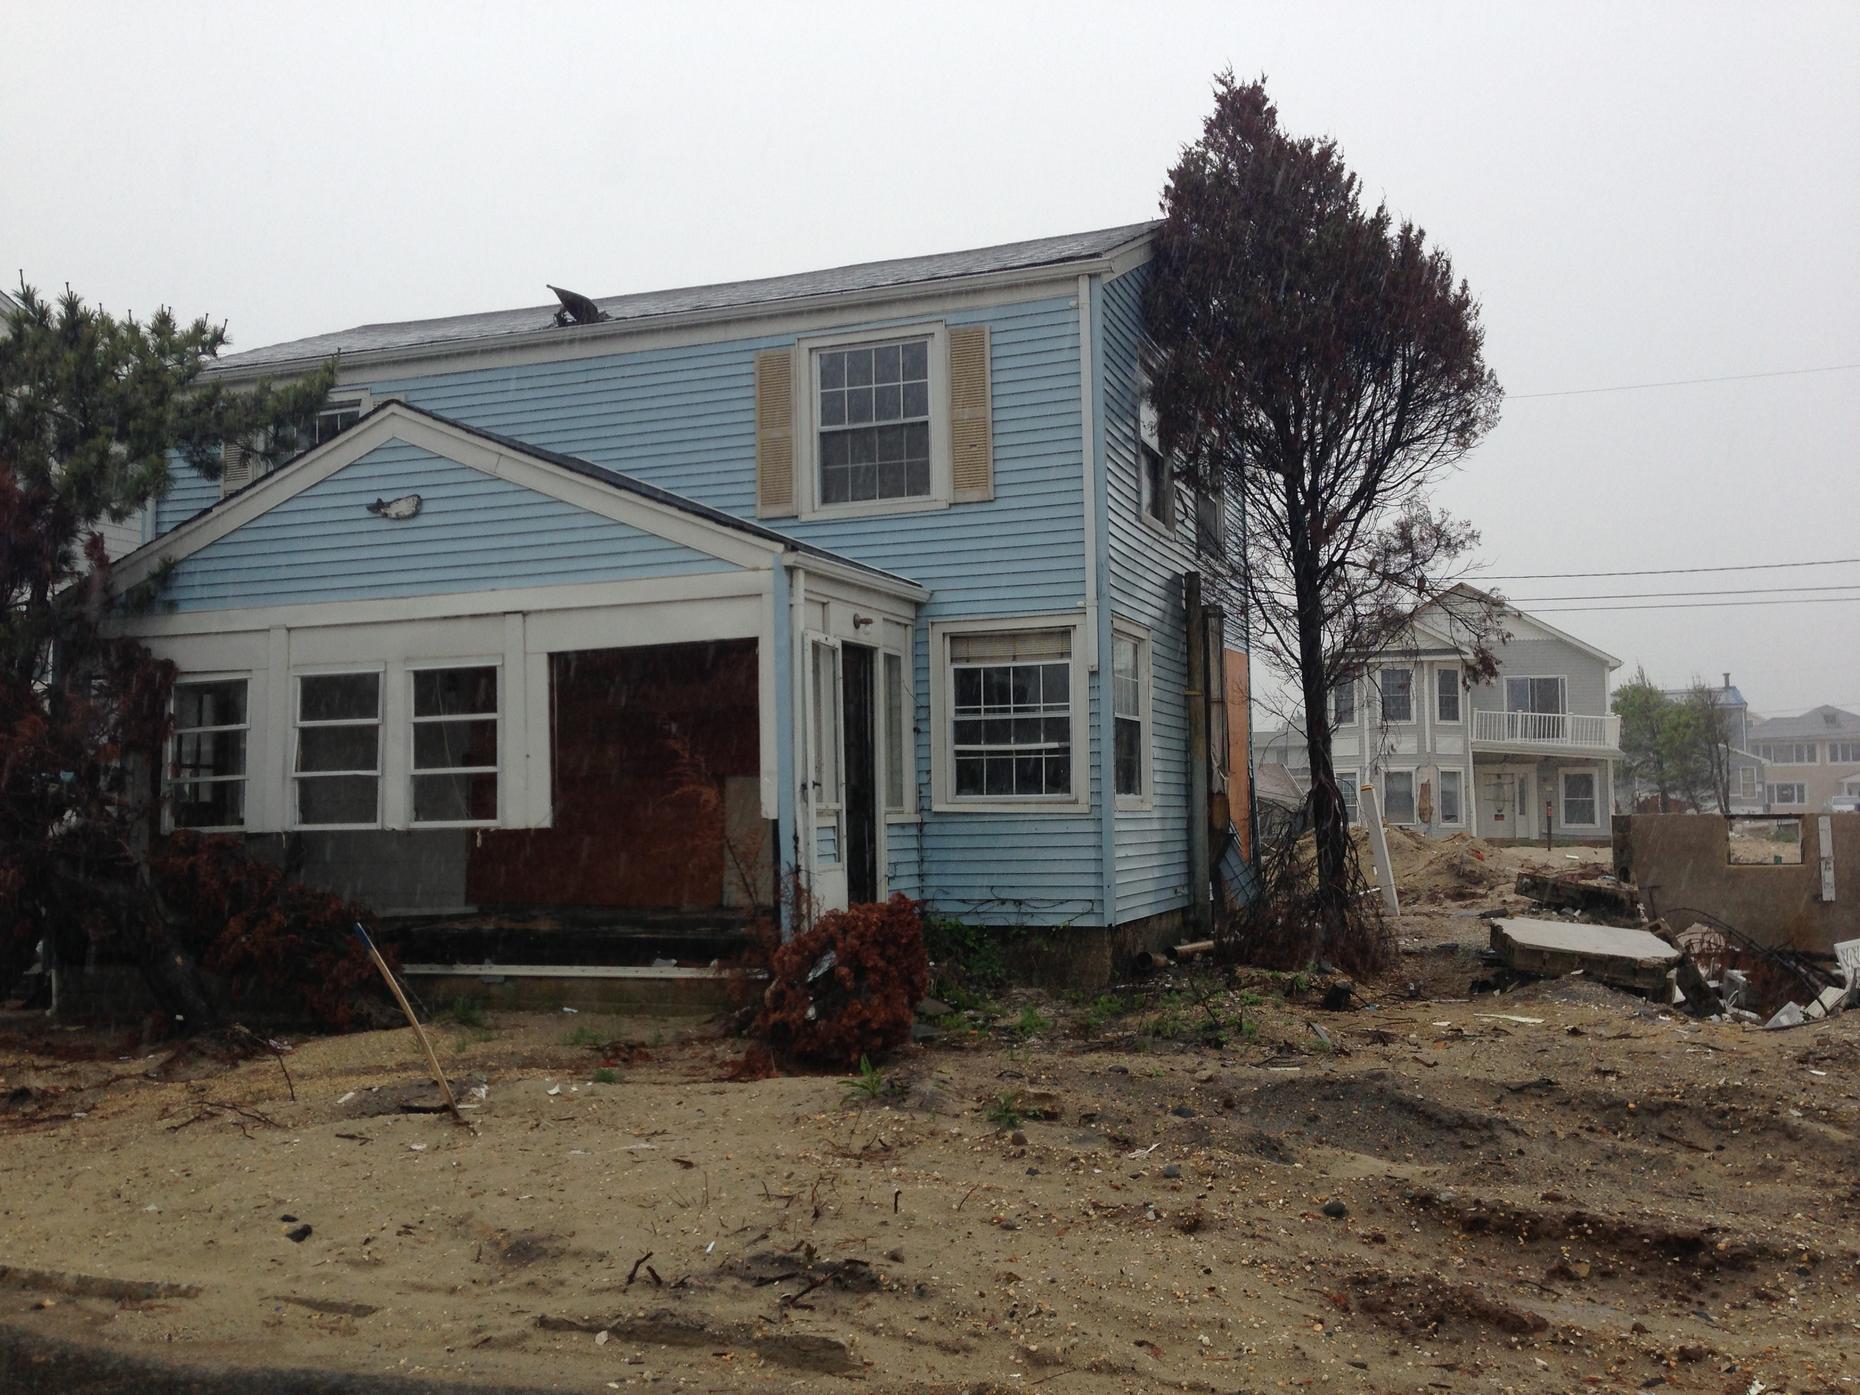 Desert House in Ortley Beach, NJ